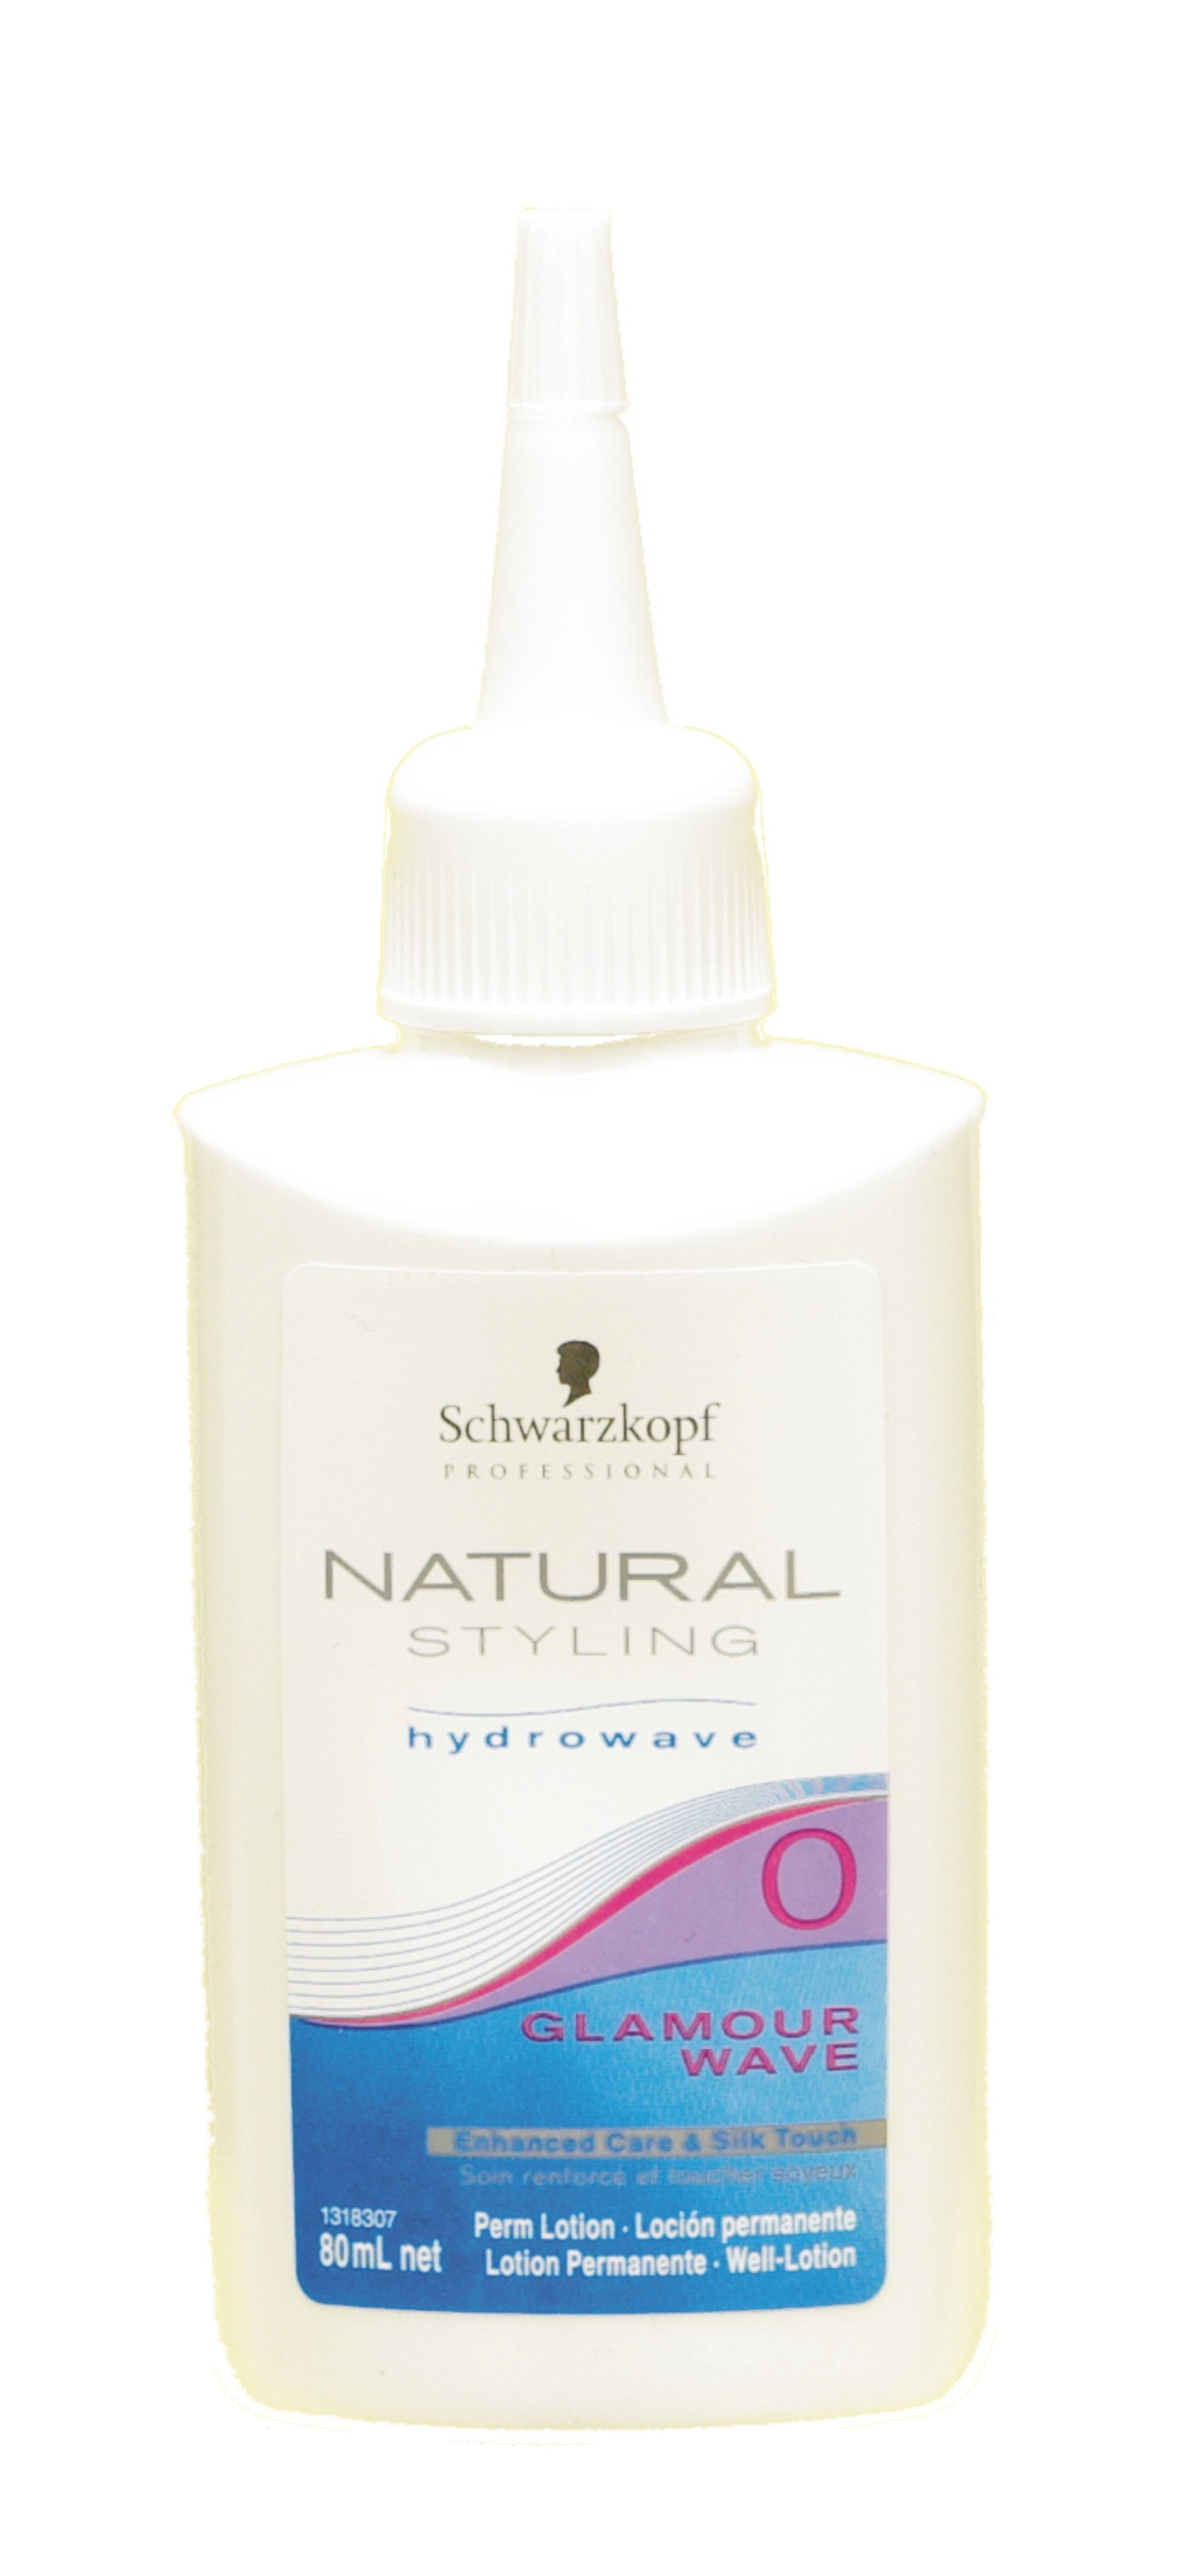 Schwarzkopf NATURAL STYLING Glamour Wave 0, 80 ml